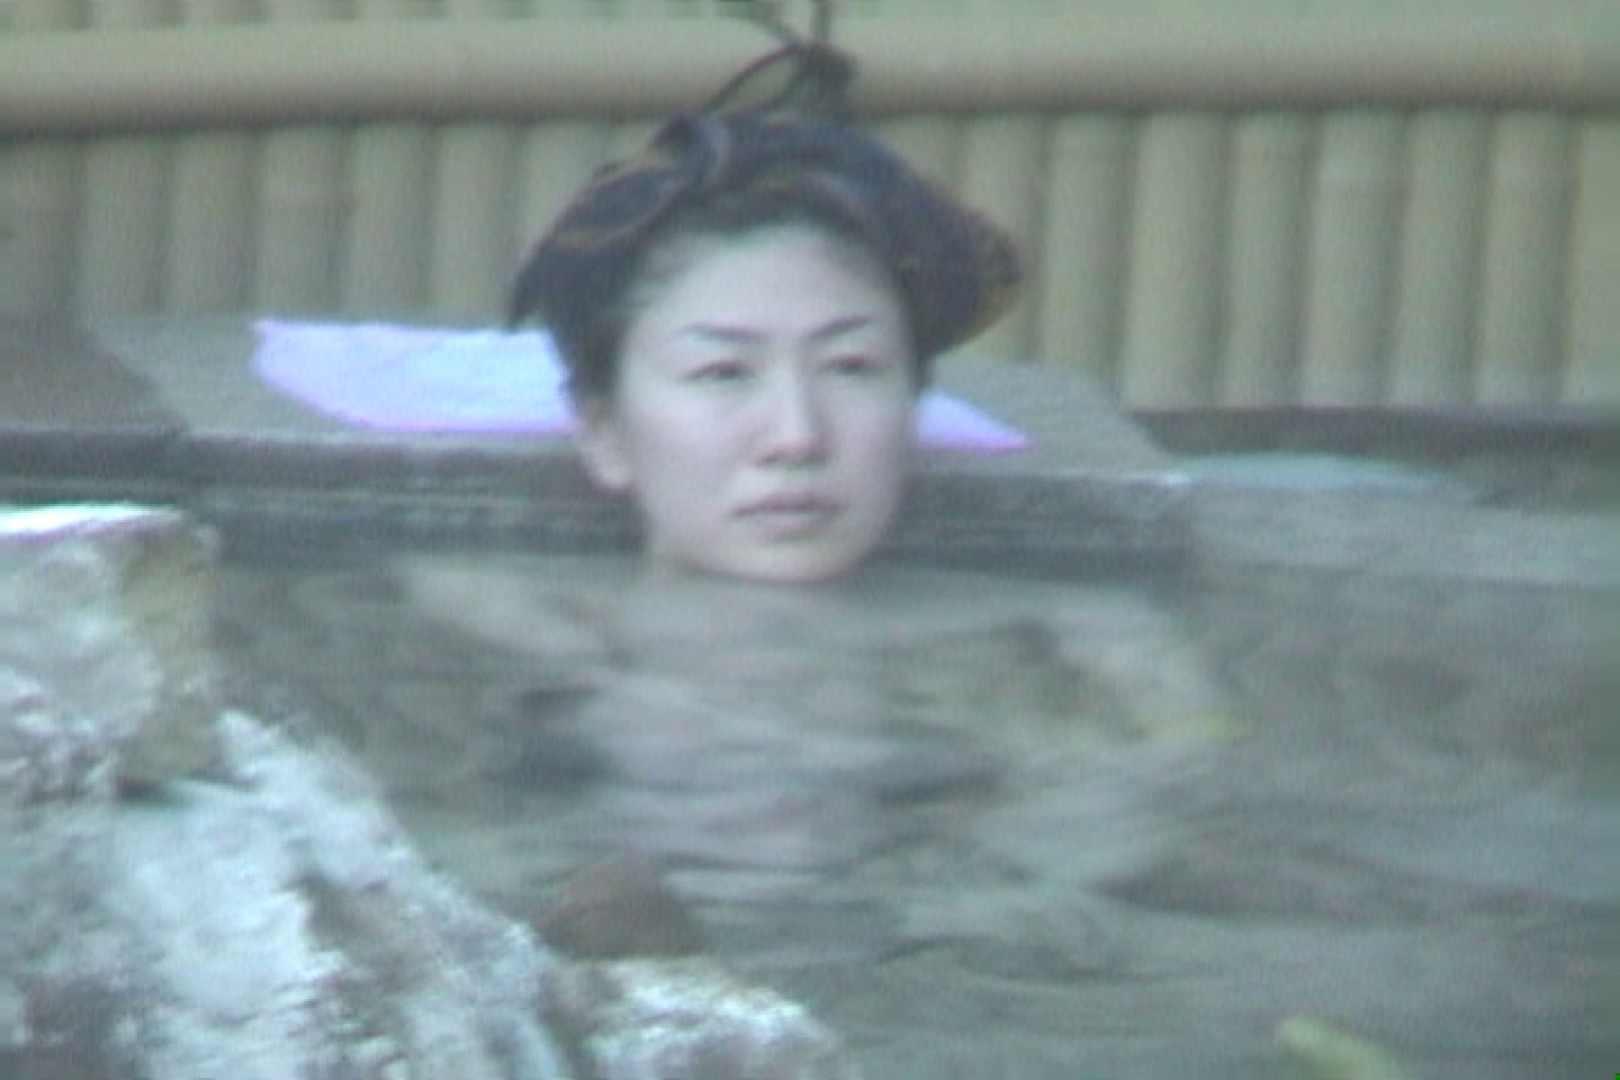 Aquaな露天風呂Vol.607 OLエロ画像 覗きオメコ動画キャプチャ 69PICs 56